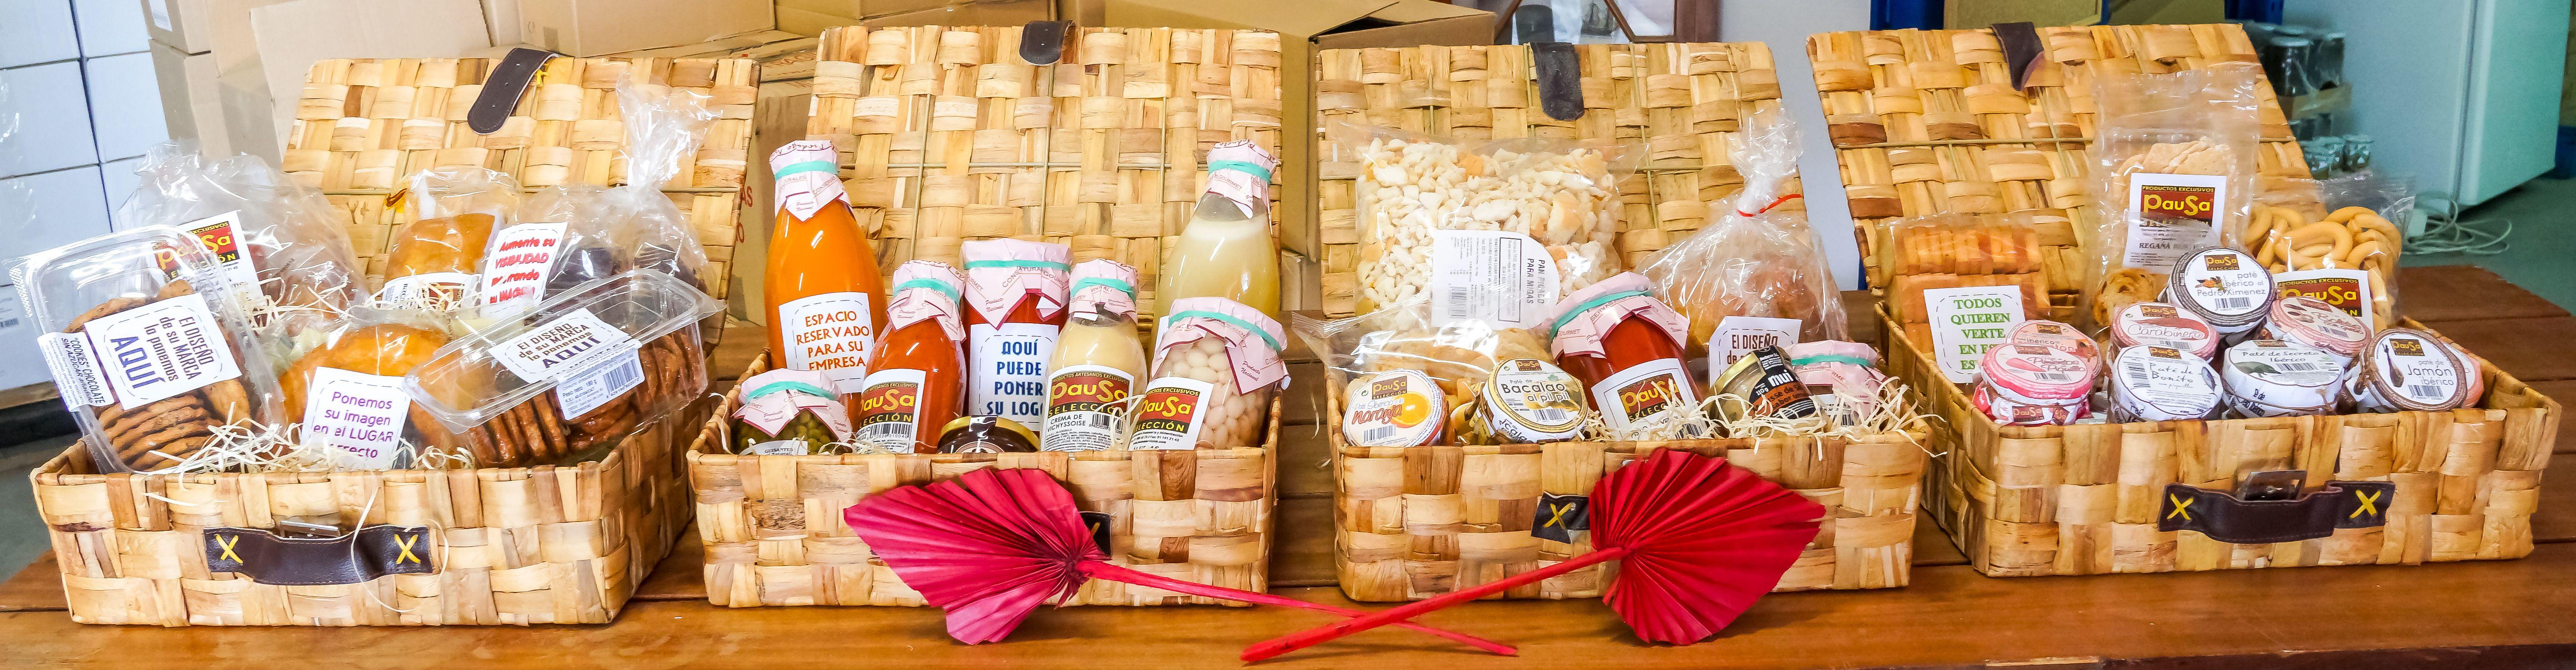 Tipologías de cestas personalizadas en Leganés